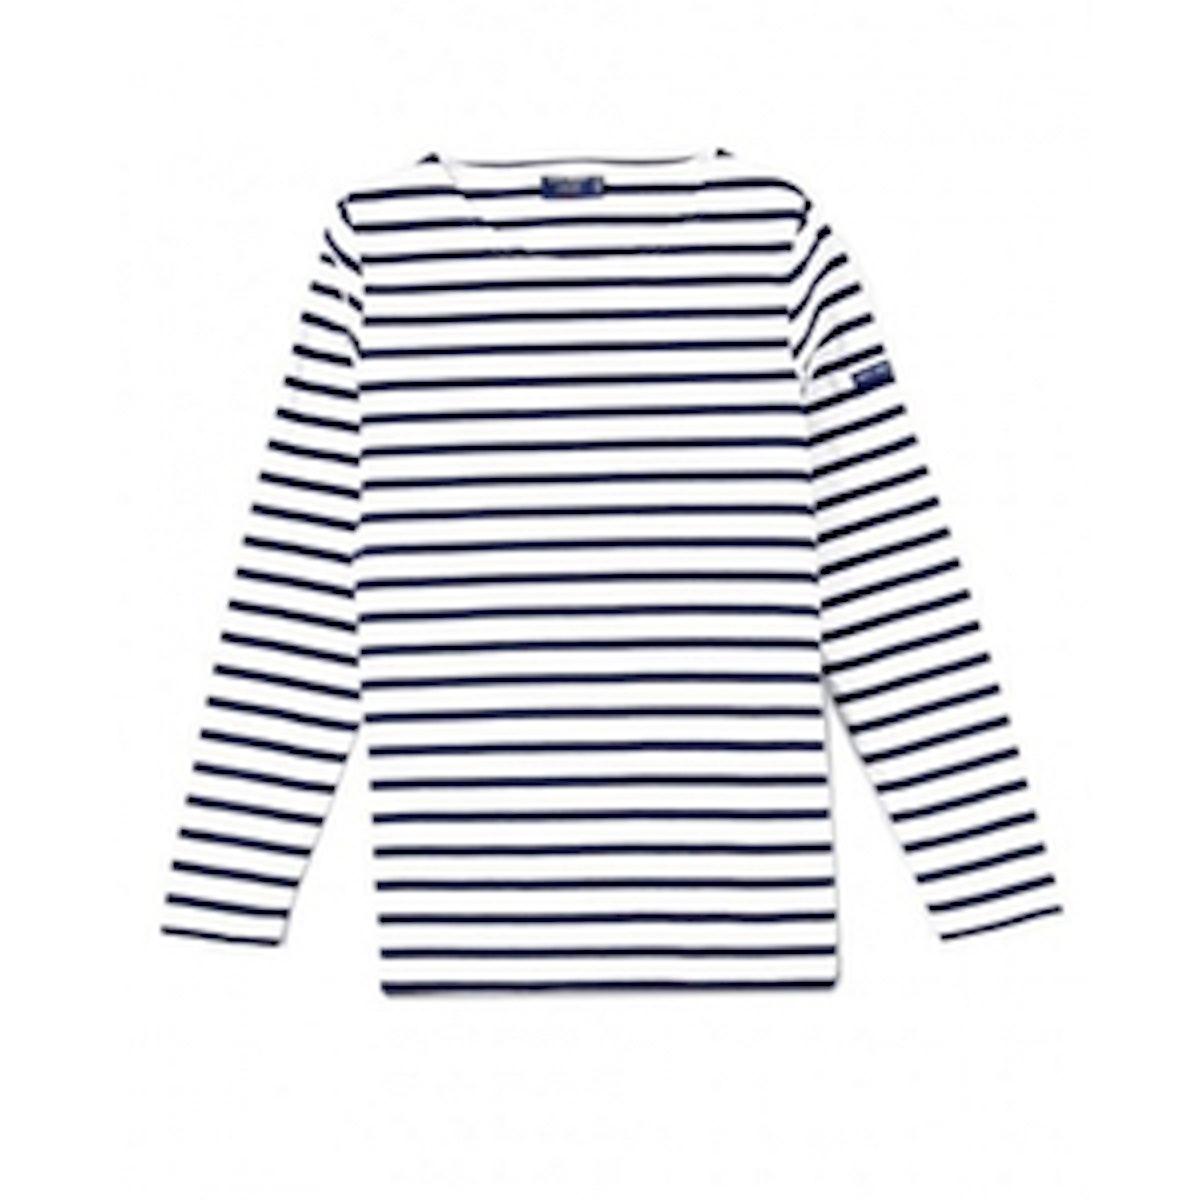 Breton Striped Shirt with Long Sleeve